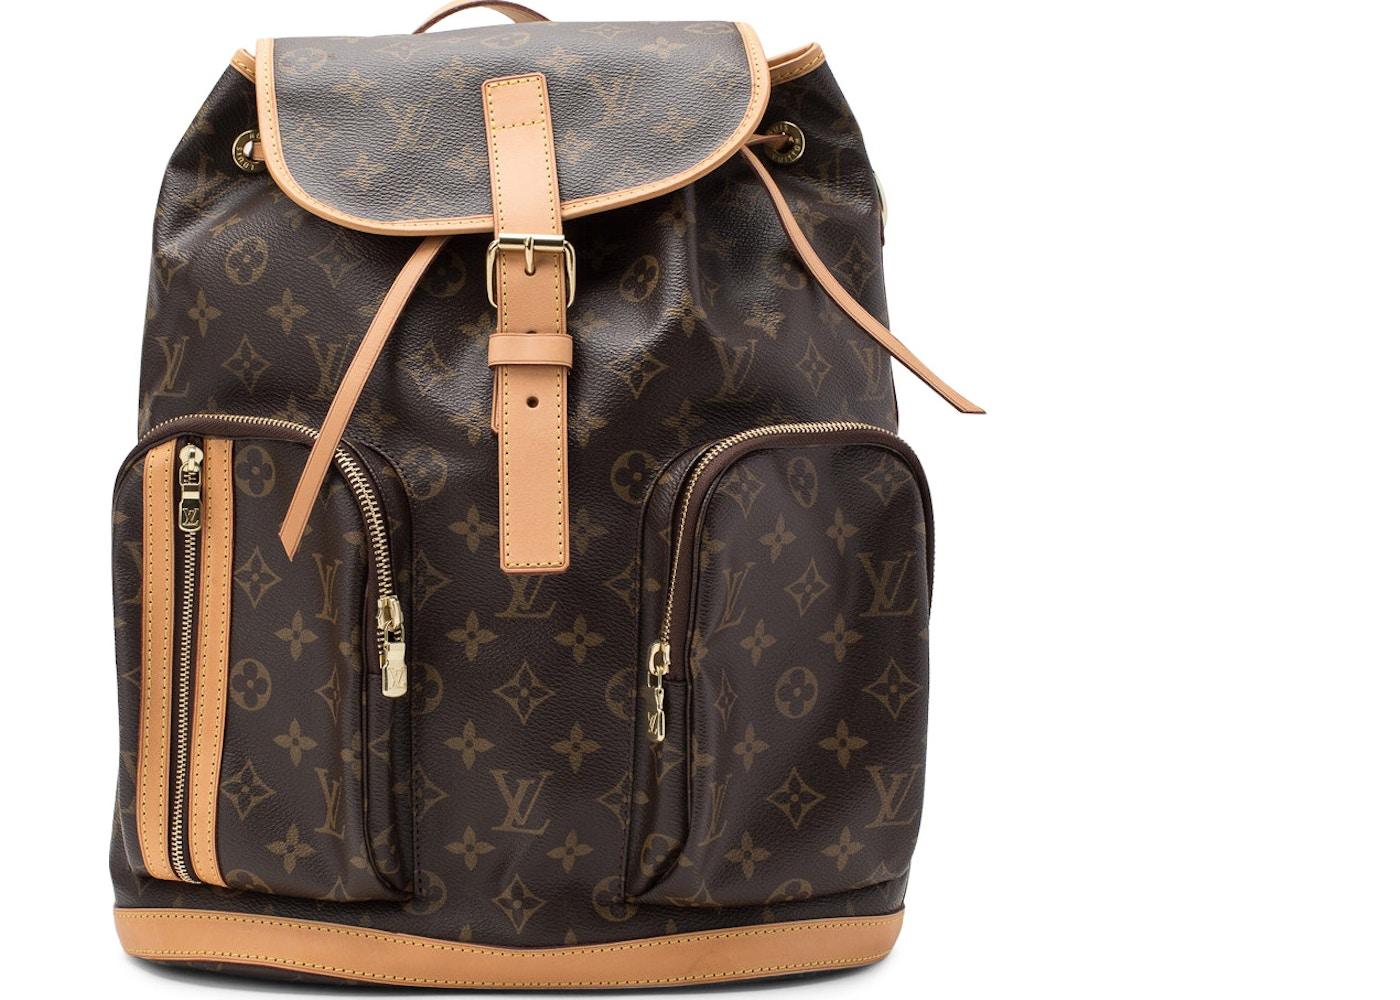 6797feca4419 Louis Vuitton Backpack Bosphore Monogram Brown. Monogram Brown